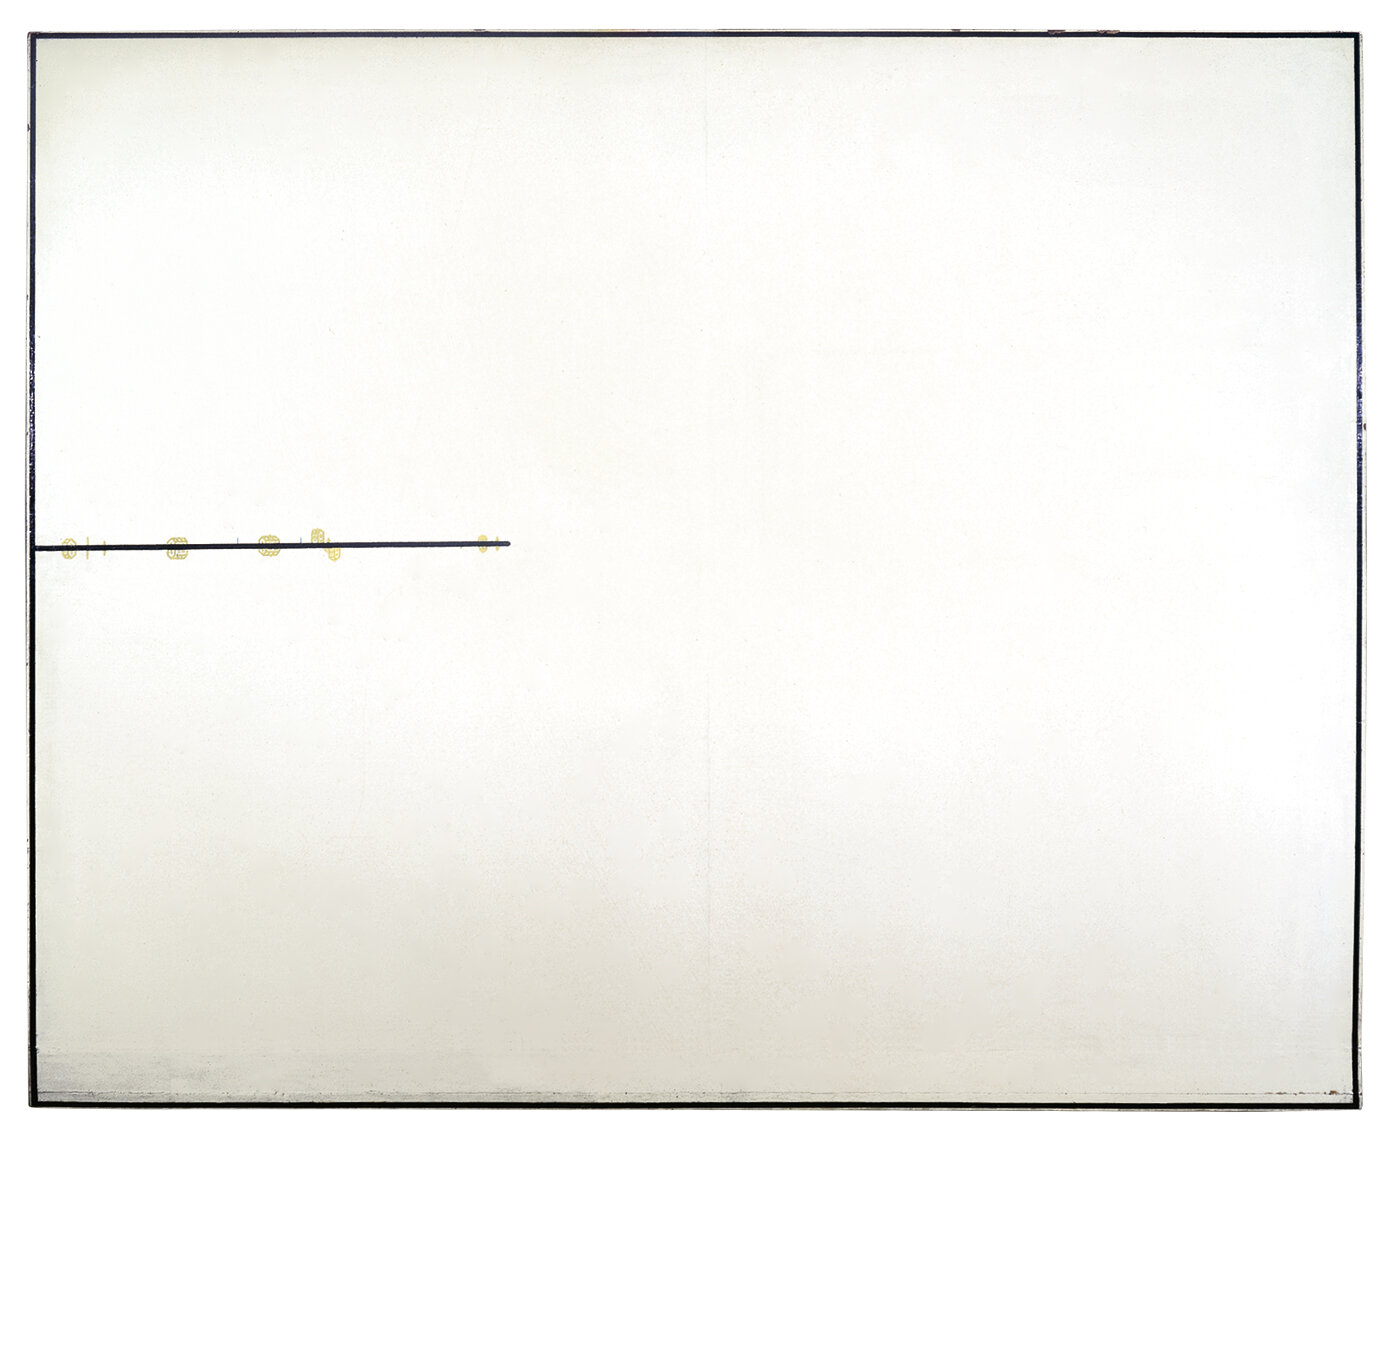 The-Berdjansk-Spit-1970-Oil-and-enamel-on-Masonite-Signed-and-dated-on-revers.jpg